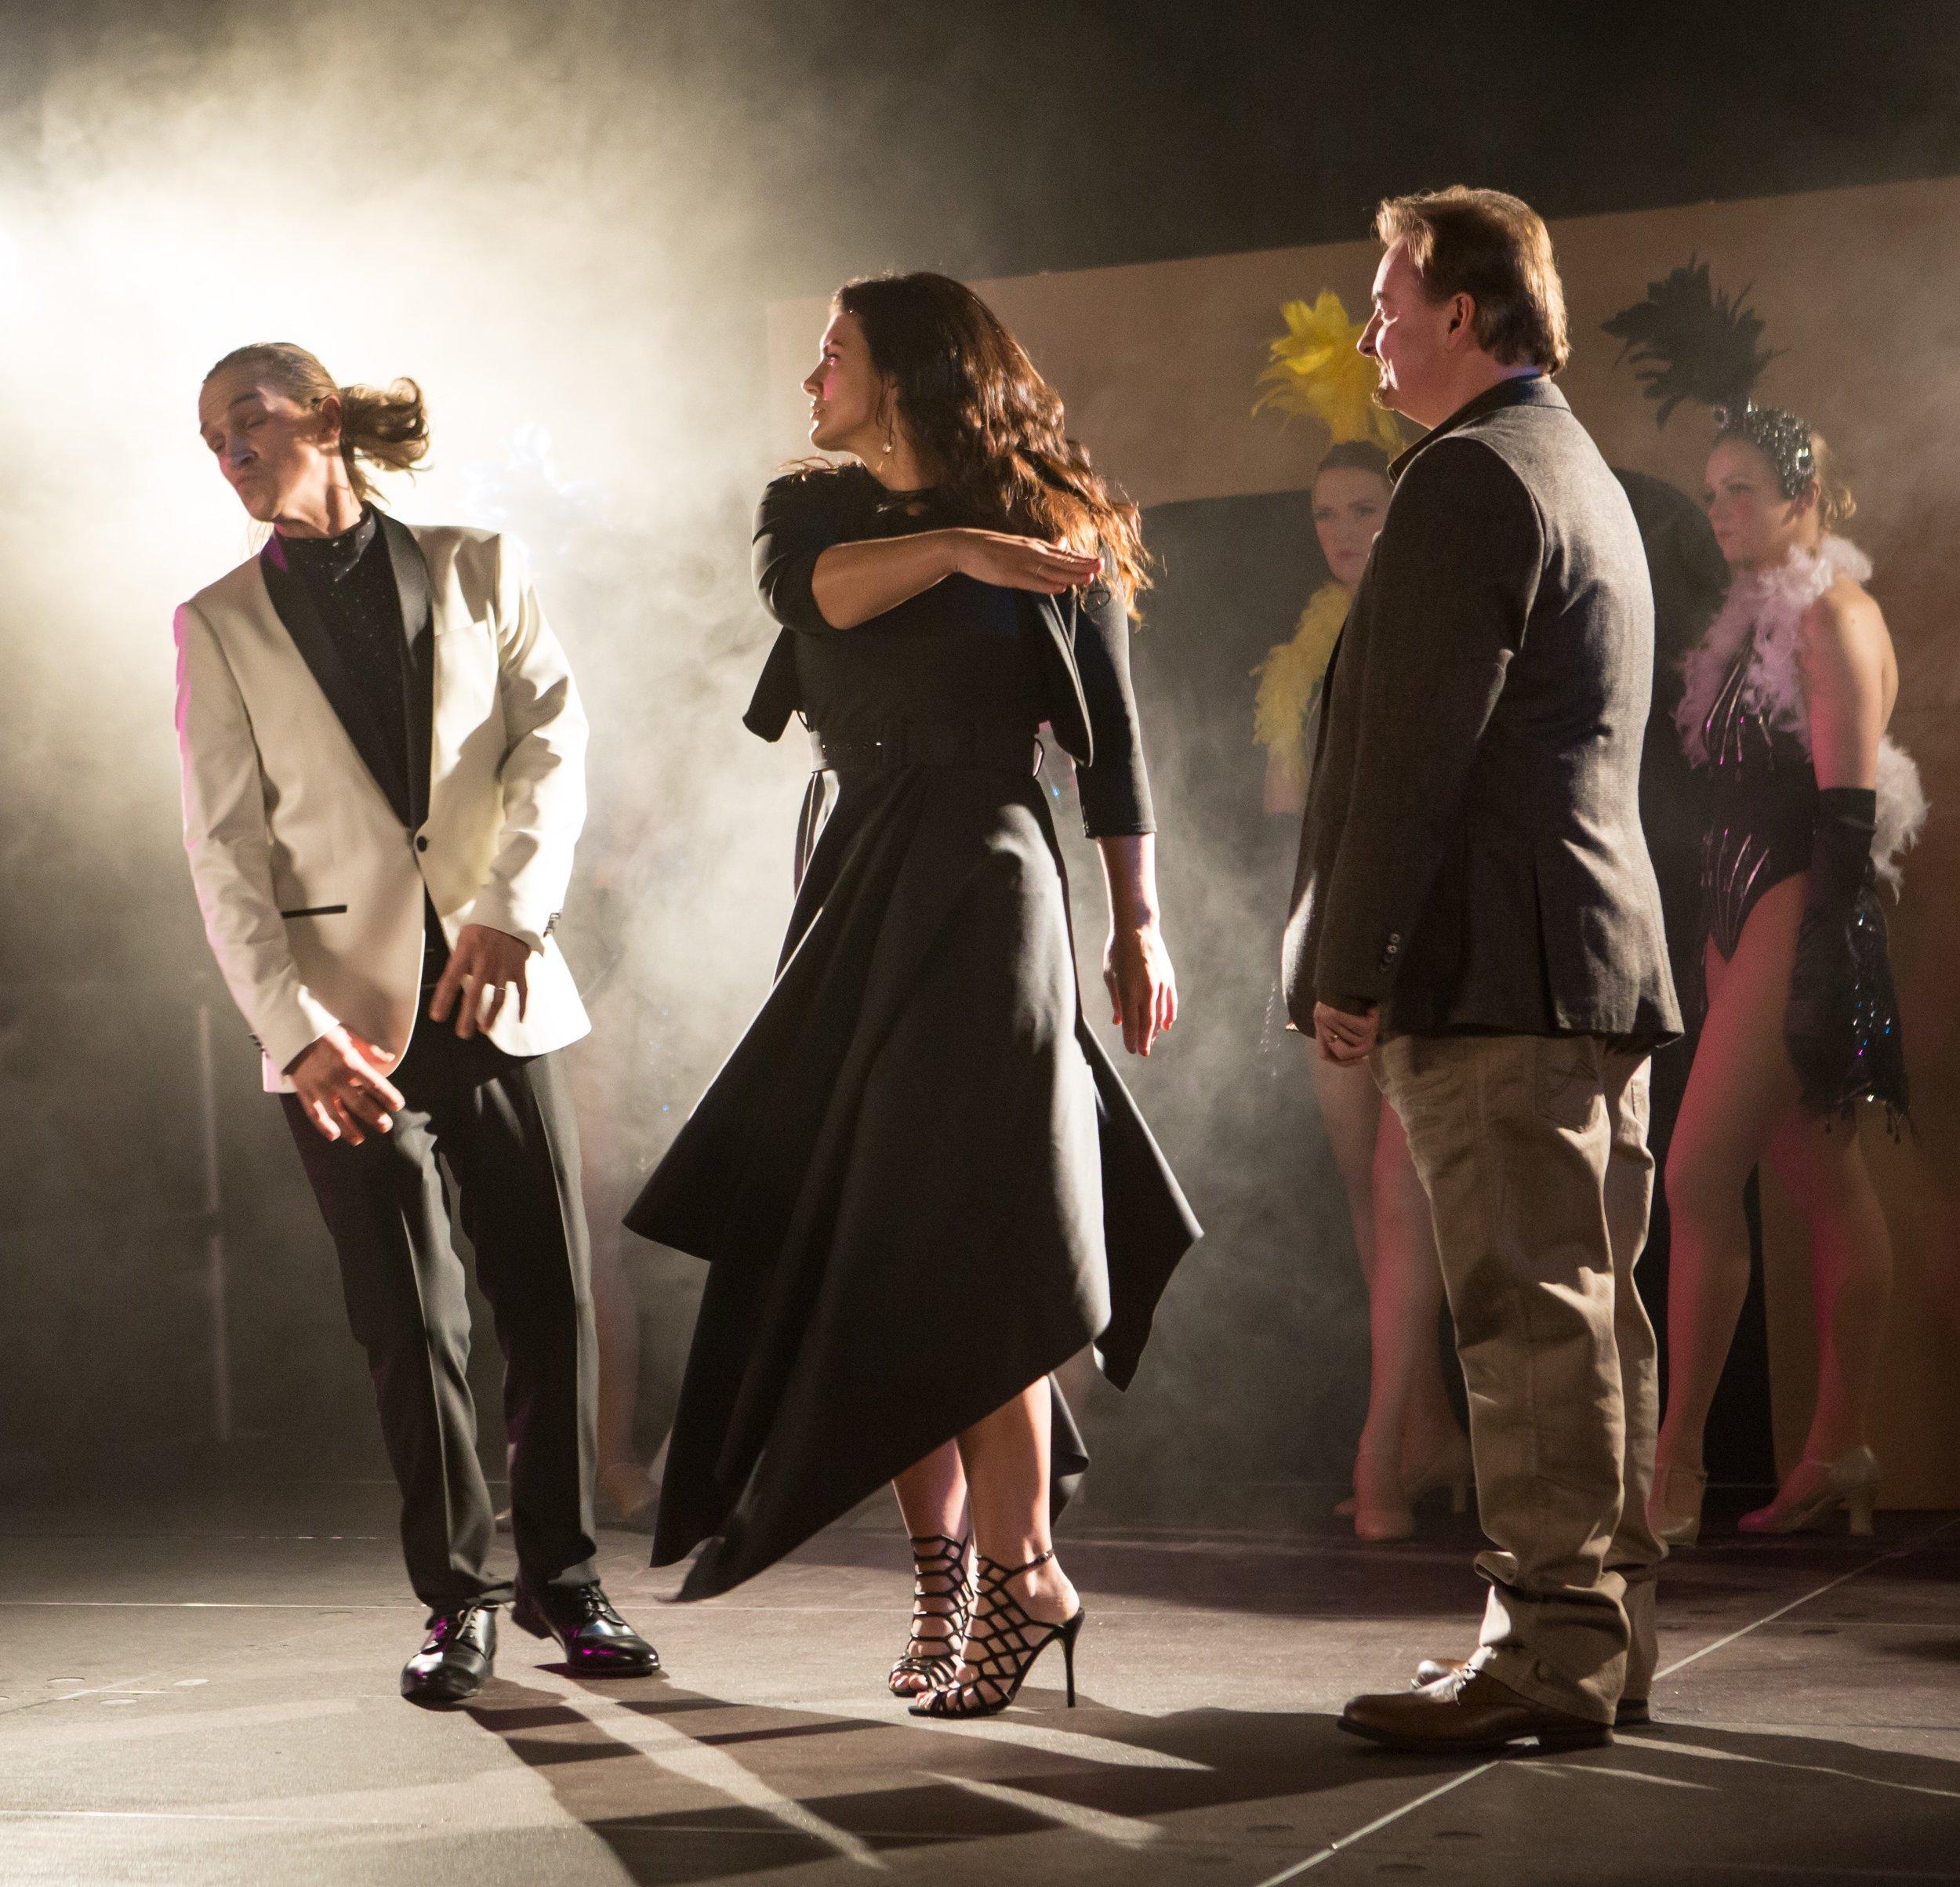 Jason Mewes (Jay), Gina Carano (Carrie), Brian O'Halloran (Brian).jpg